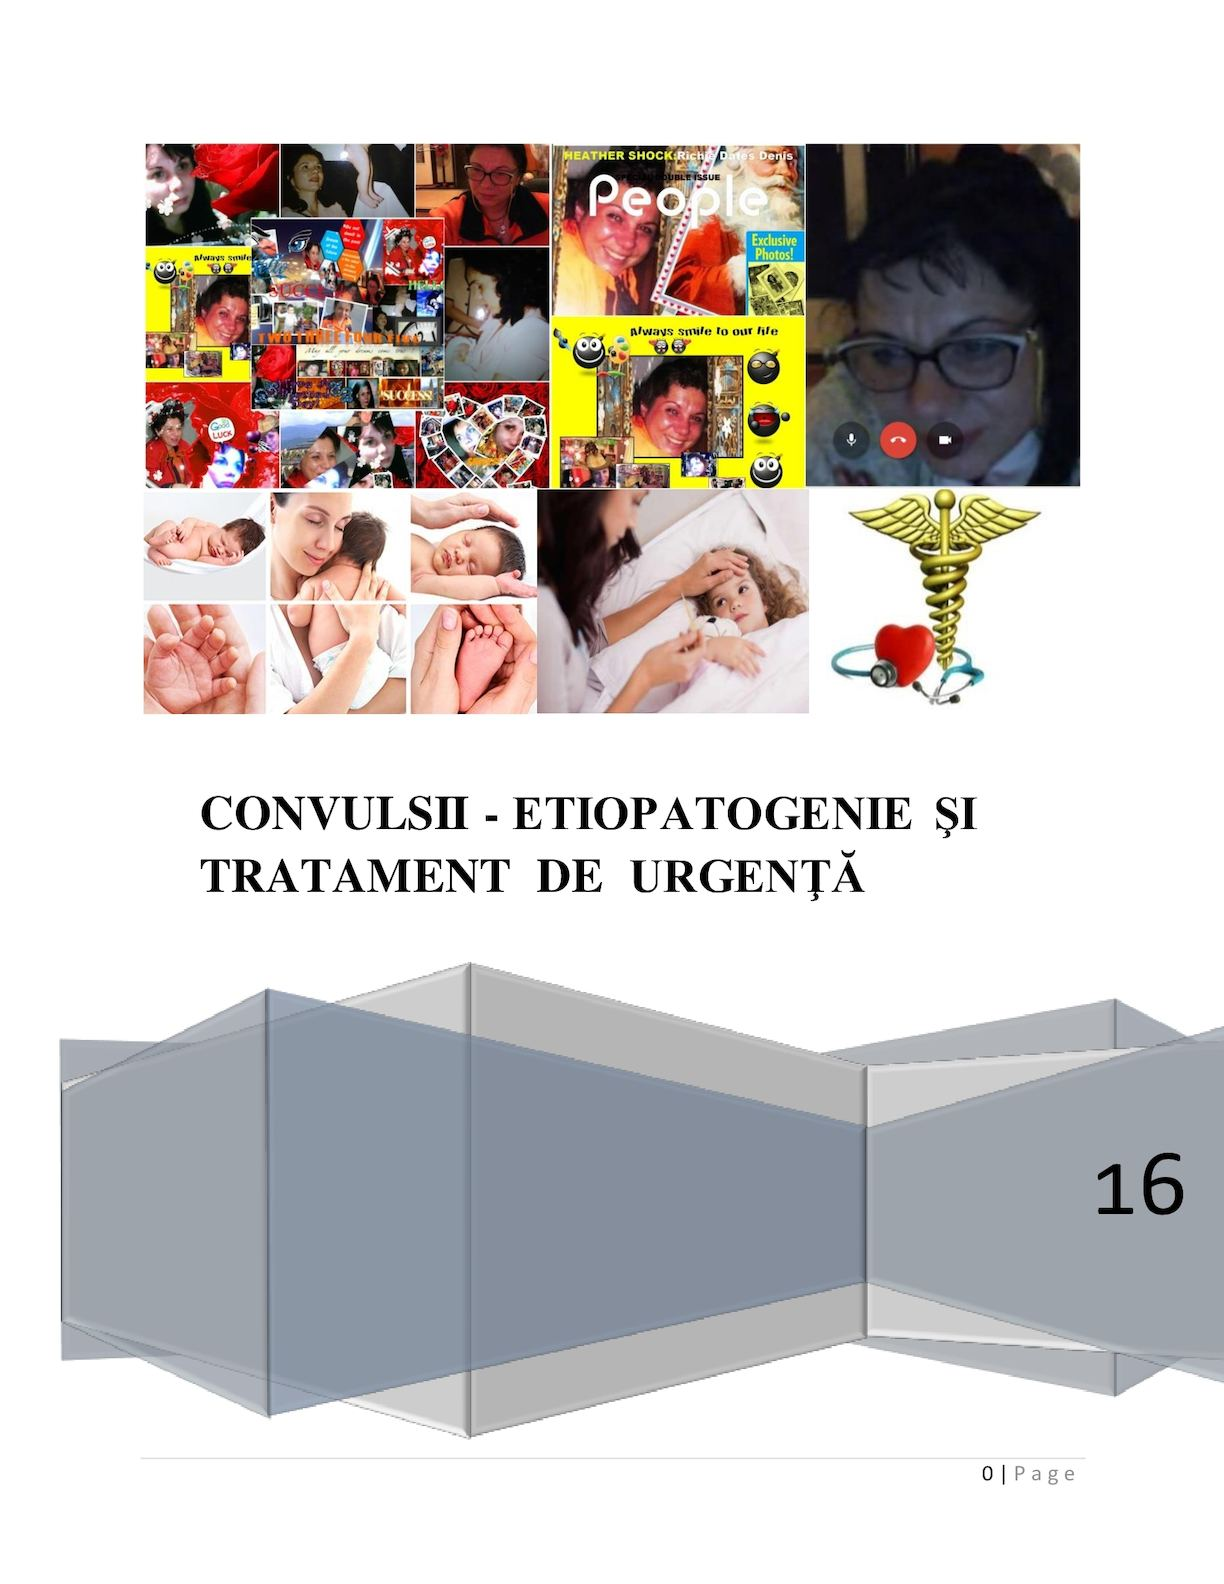 varicoză tratamentul convulsiilor)